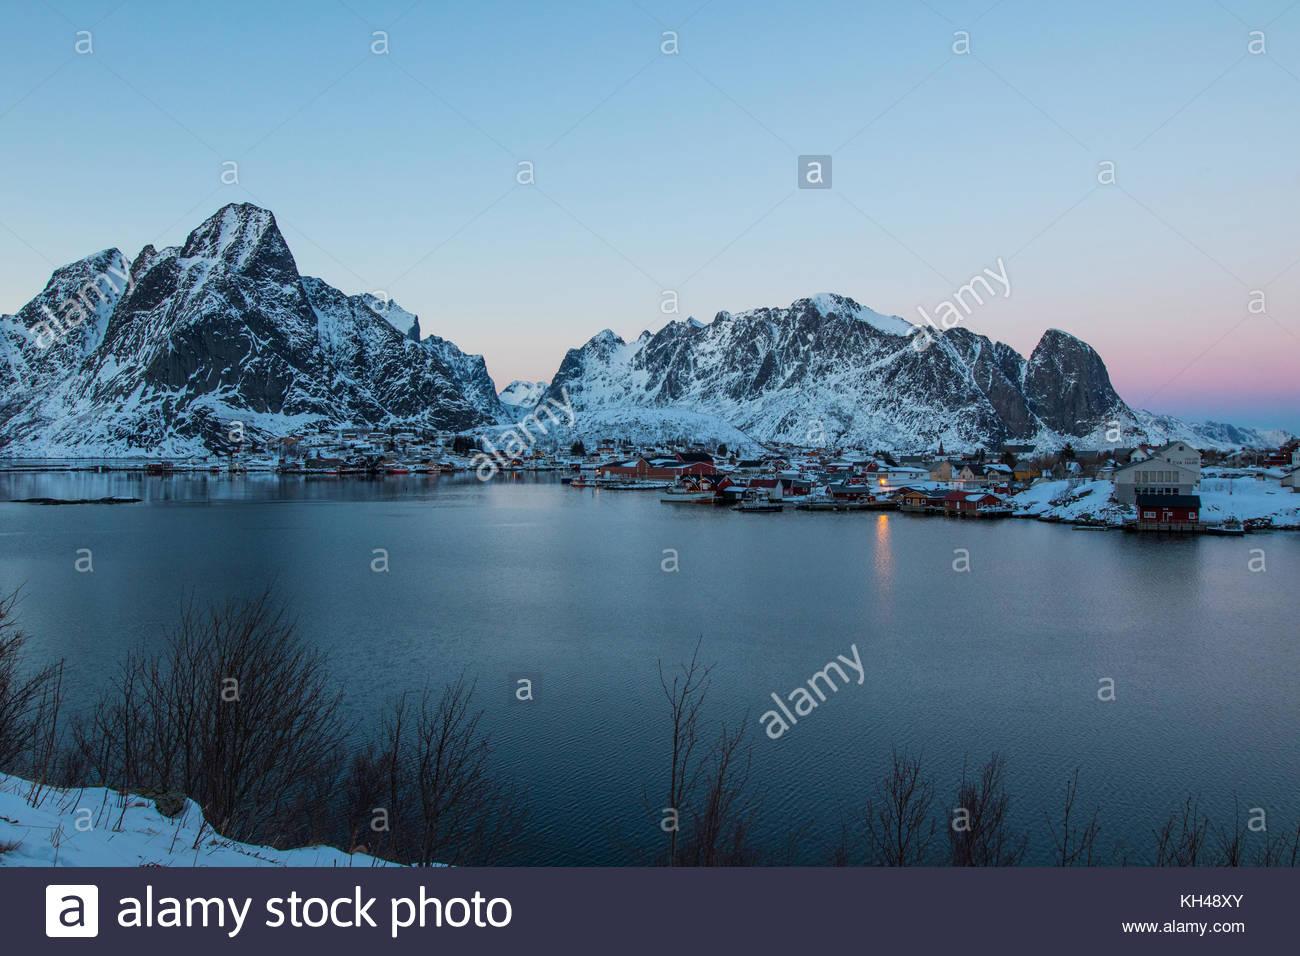 Reine, moskenes, moskenesøya, Lofoten, Nordland, Norvegia, marzo 2017 Foto Stock